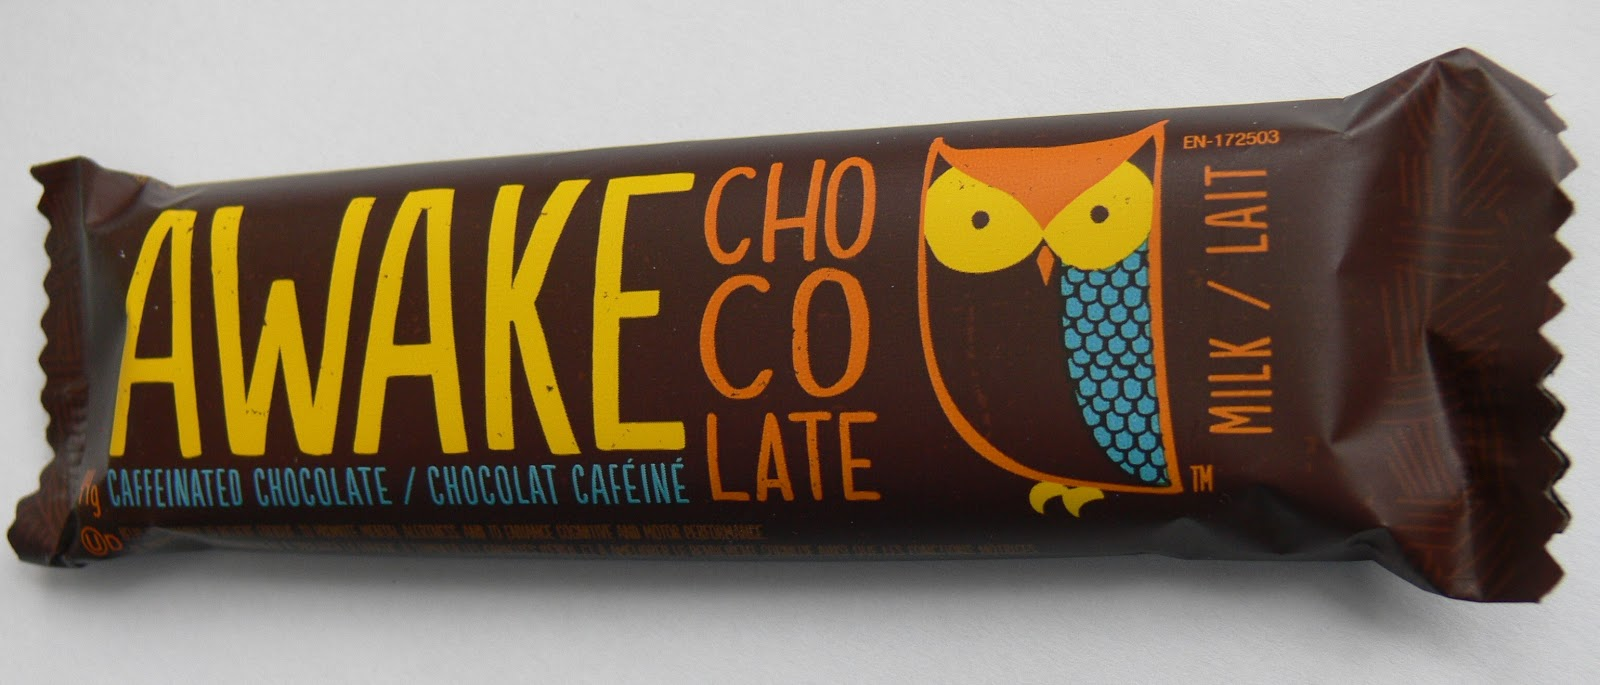 The Ultimate Chocolate Blog: Are you awake?